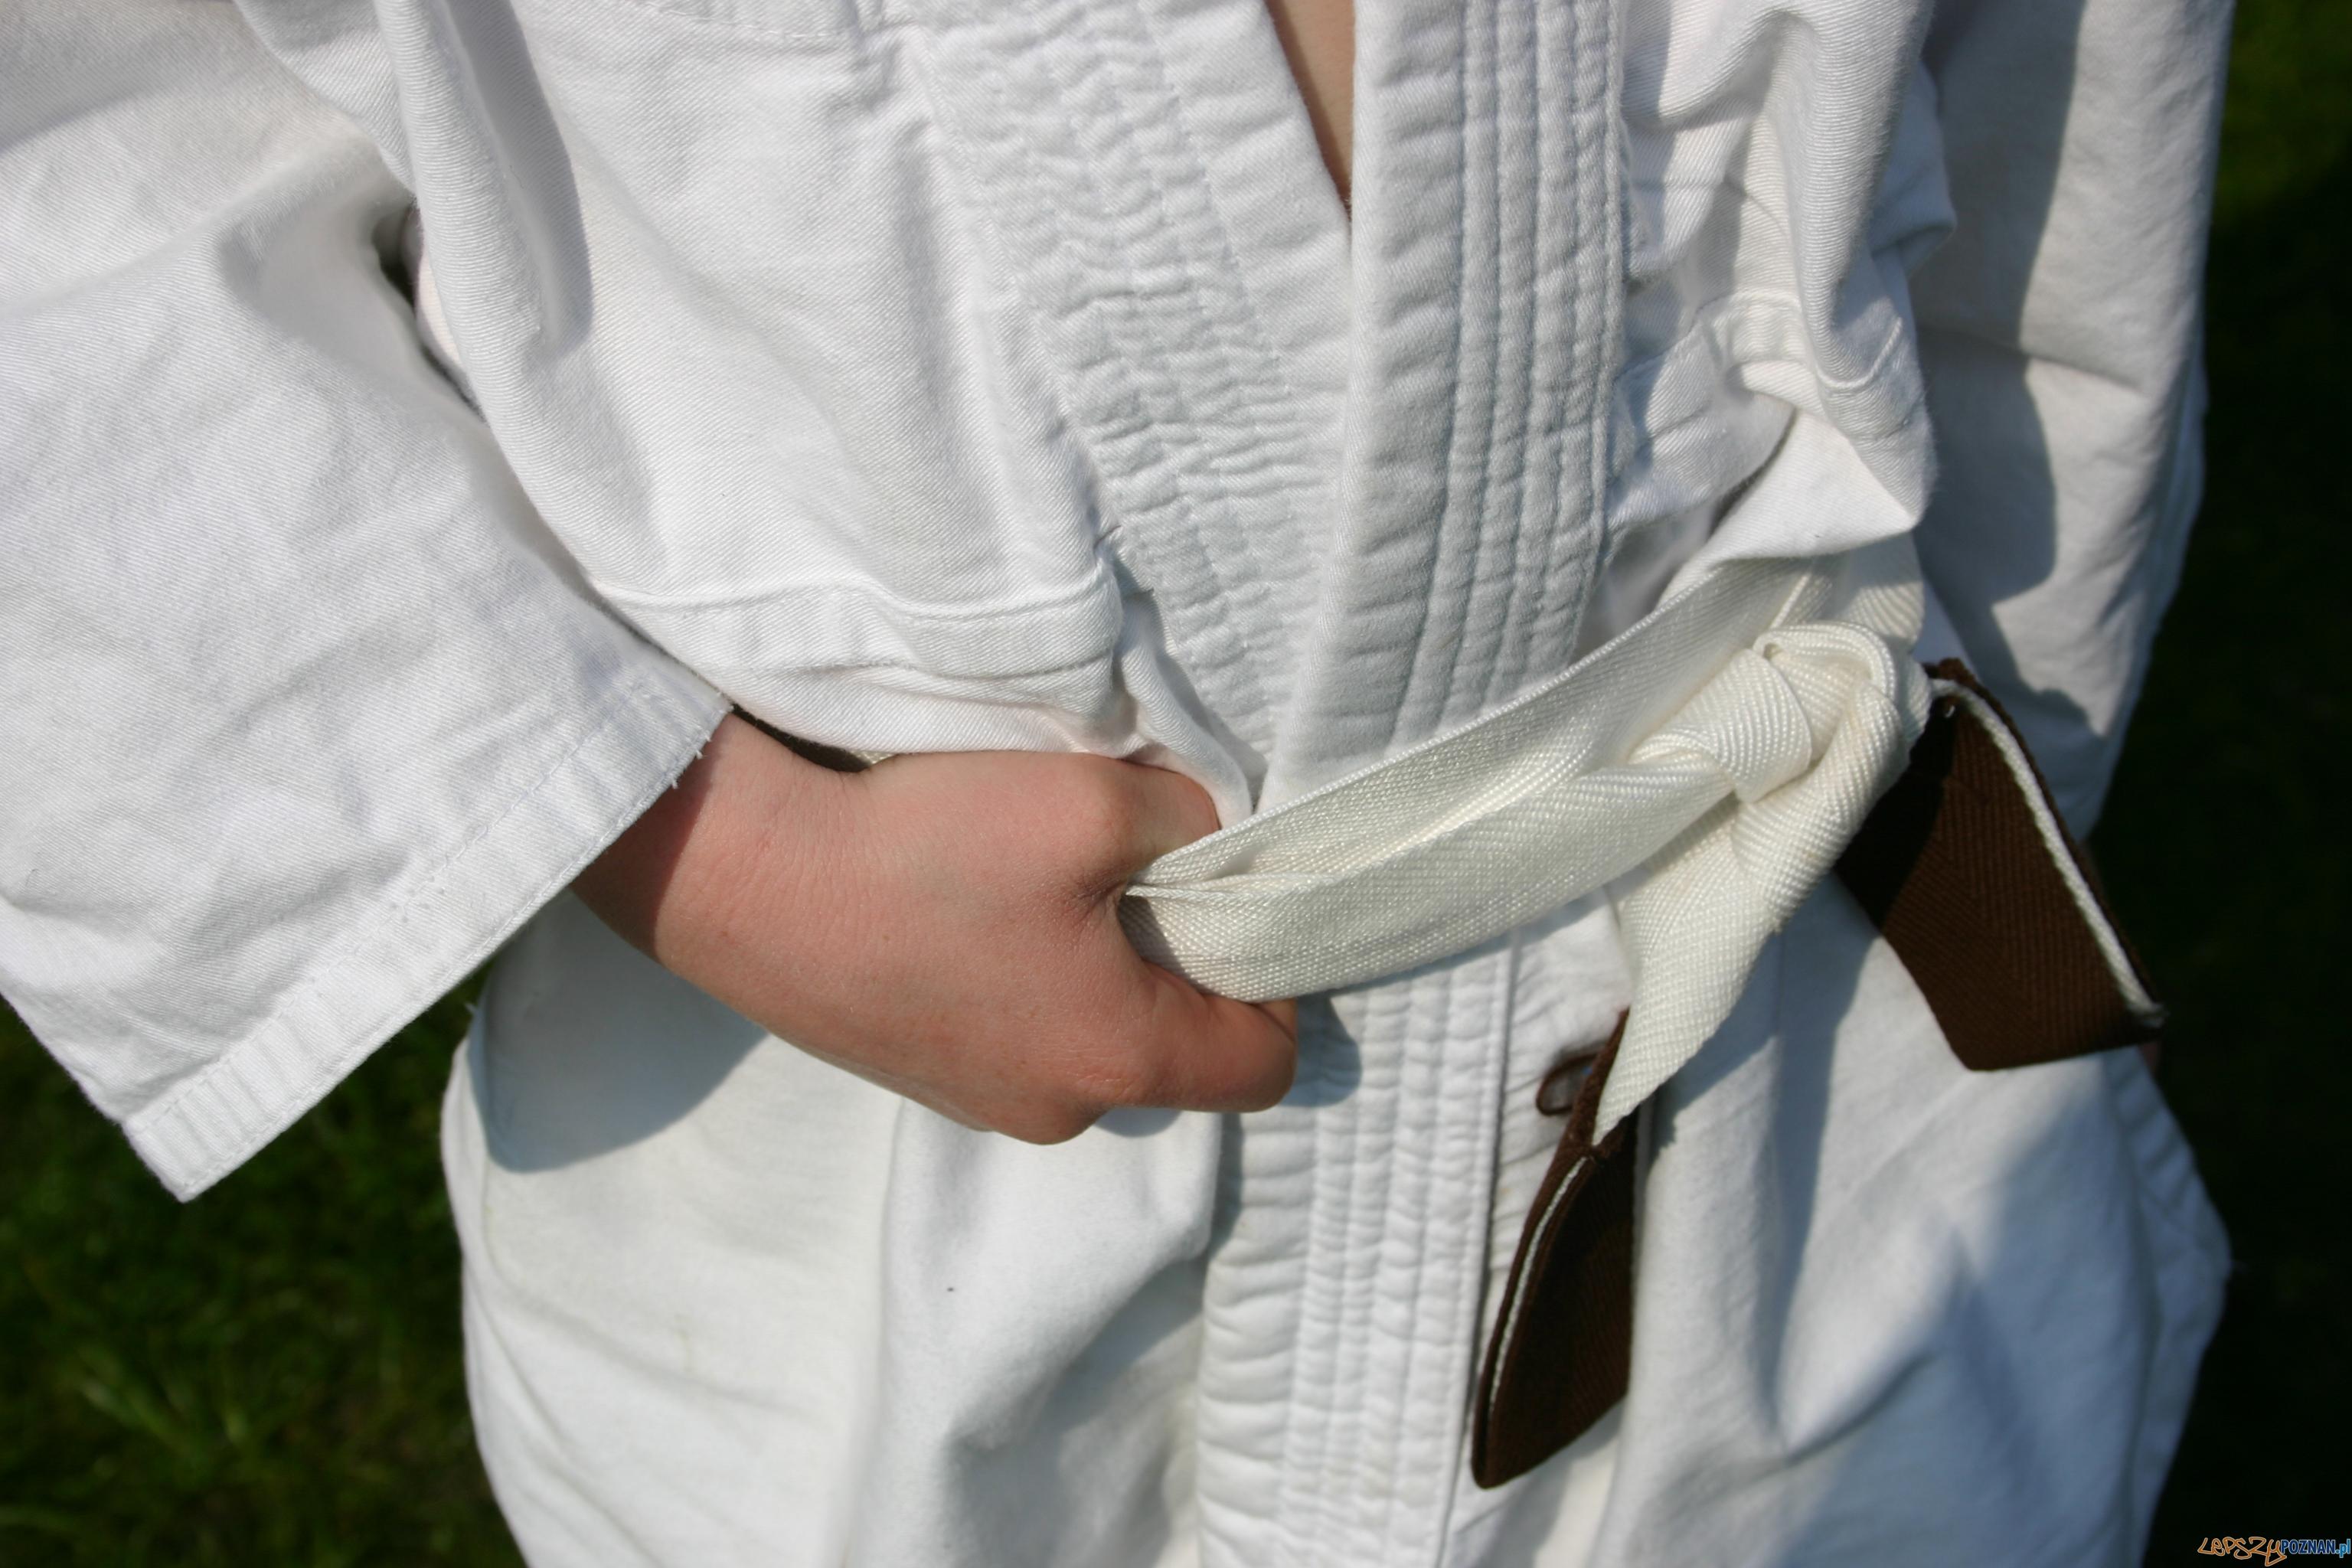 judo / karate  Foto: sxc